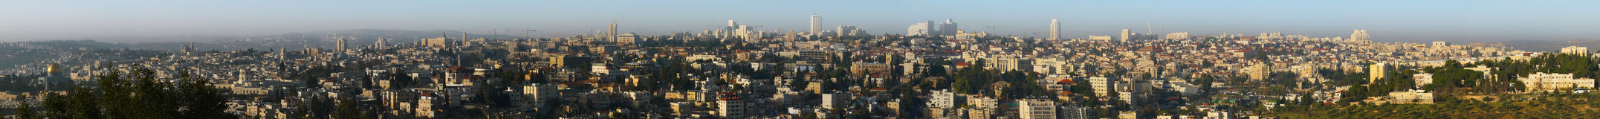 israel panorama Jerusalem obrazy royalty free